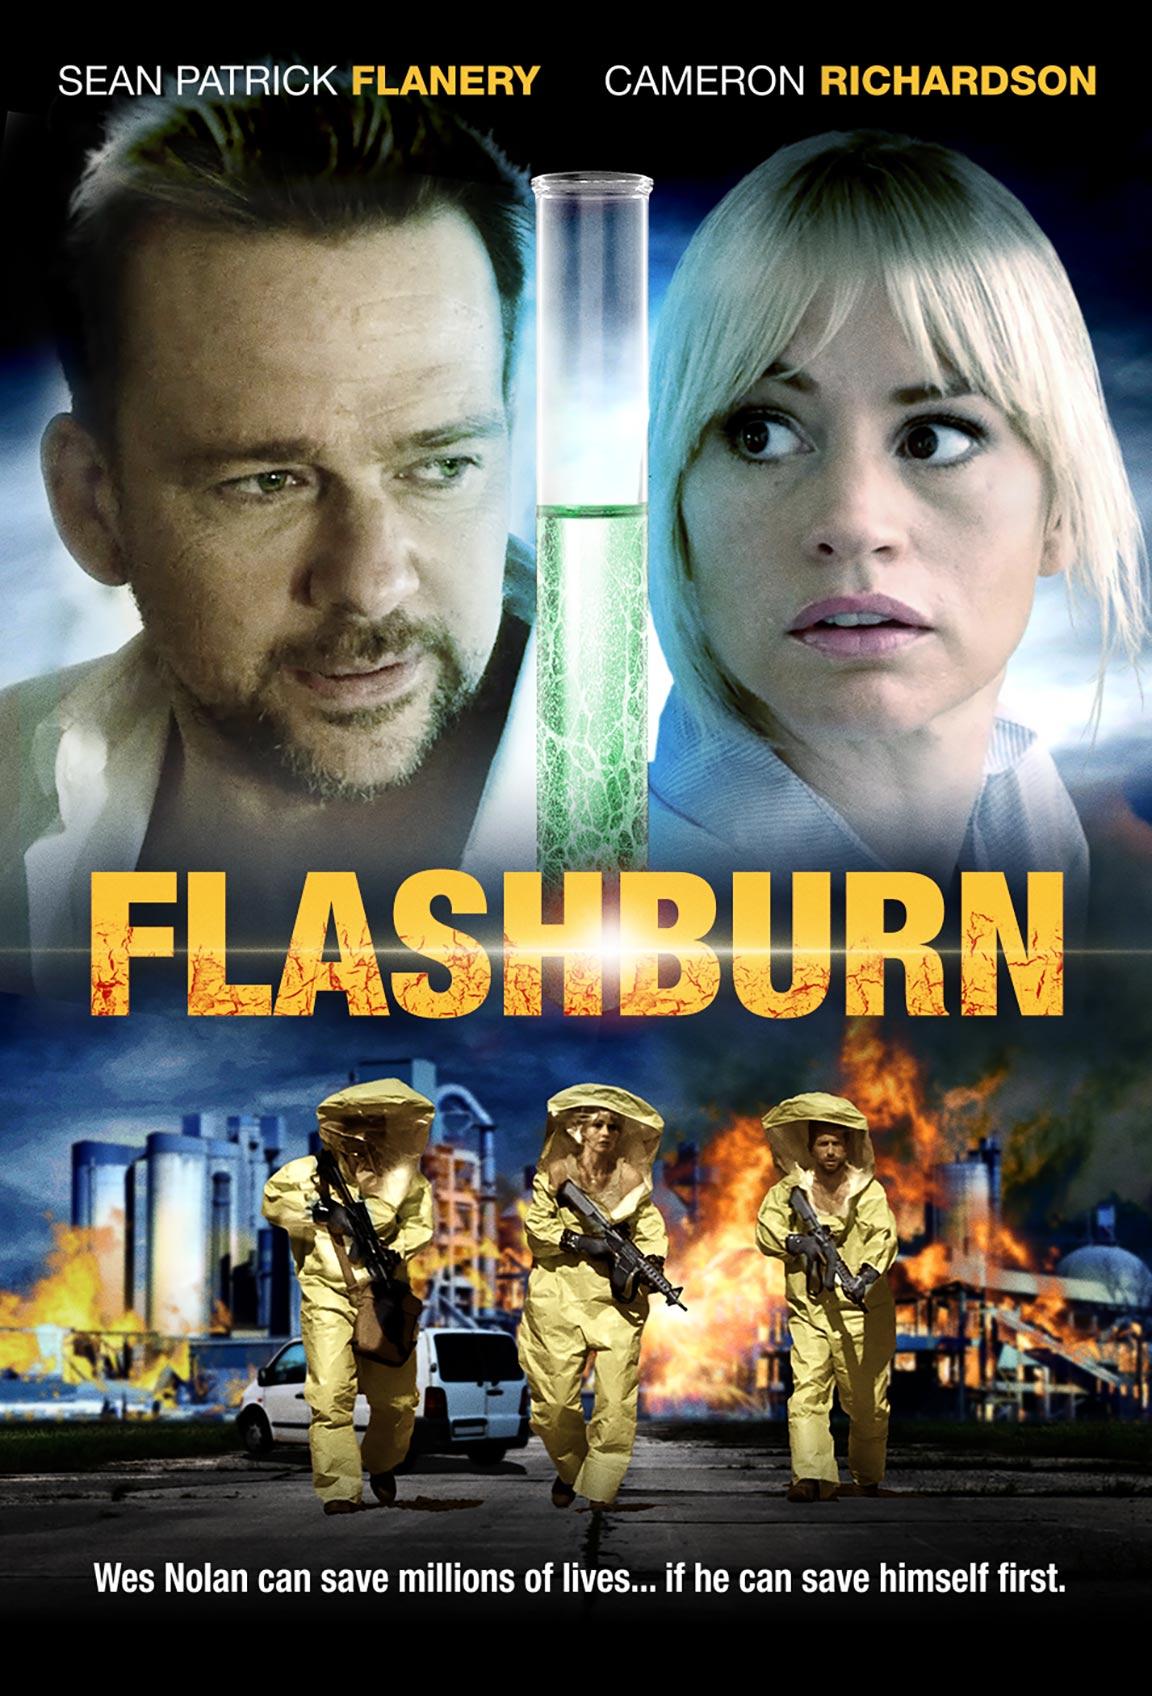 Flashburn Poster #1